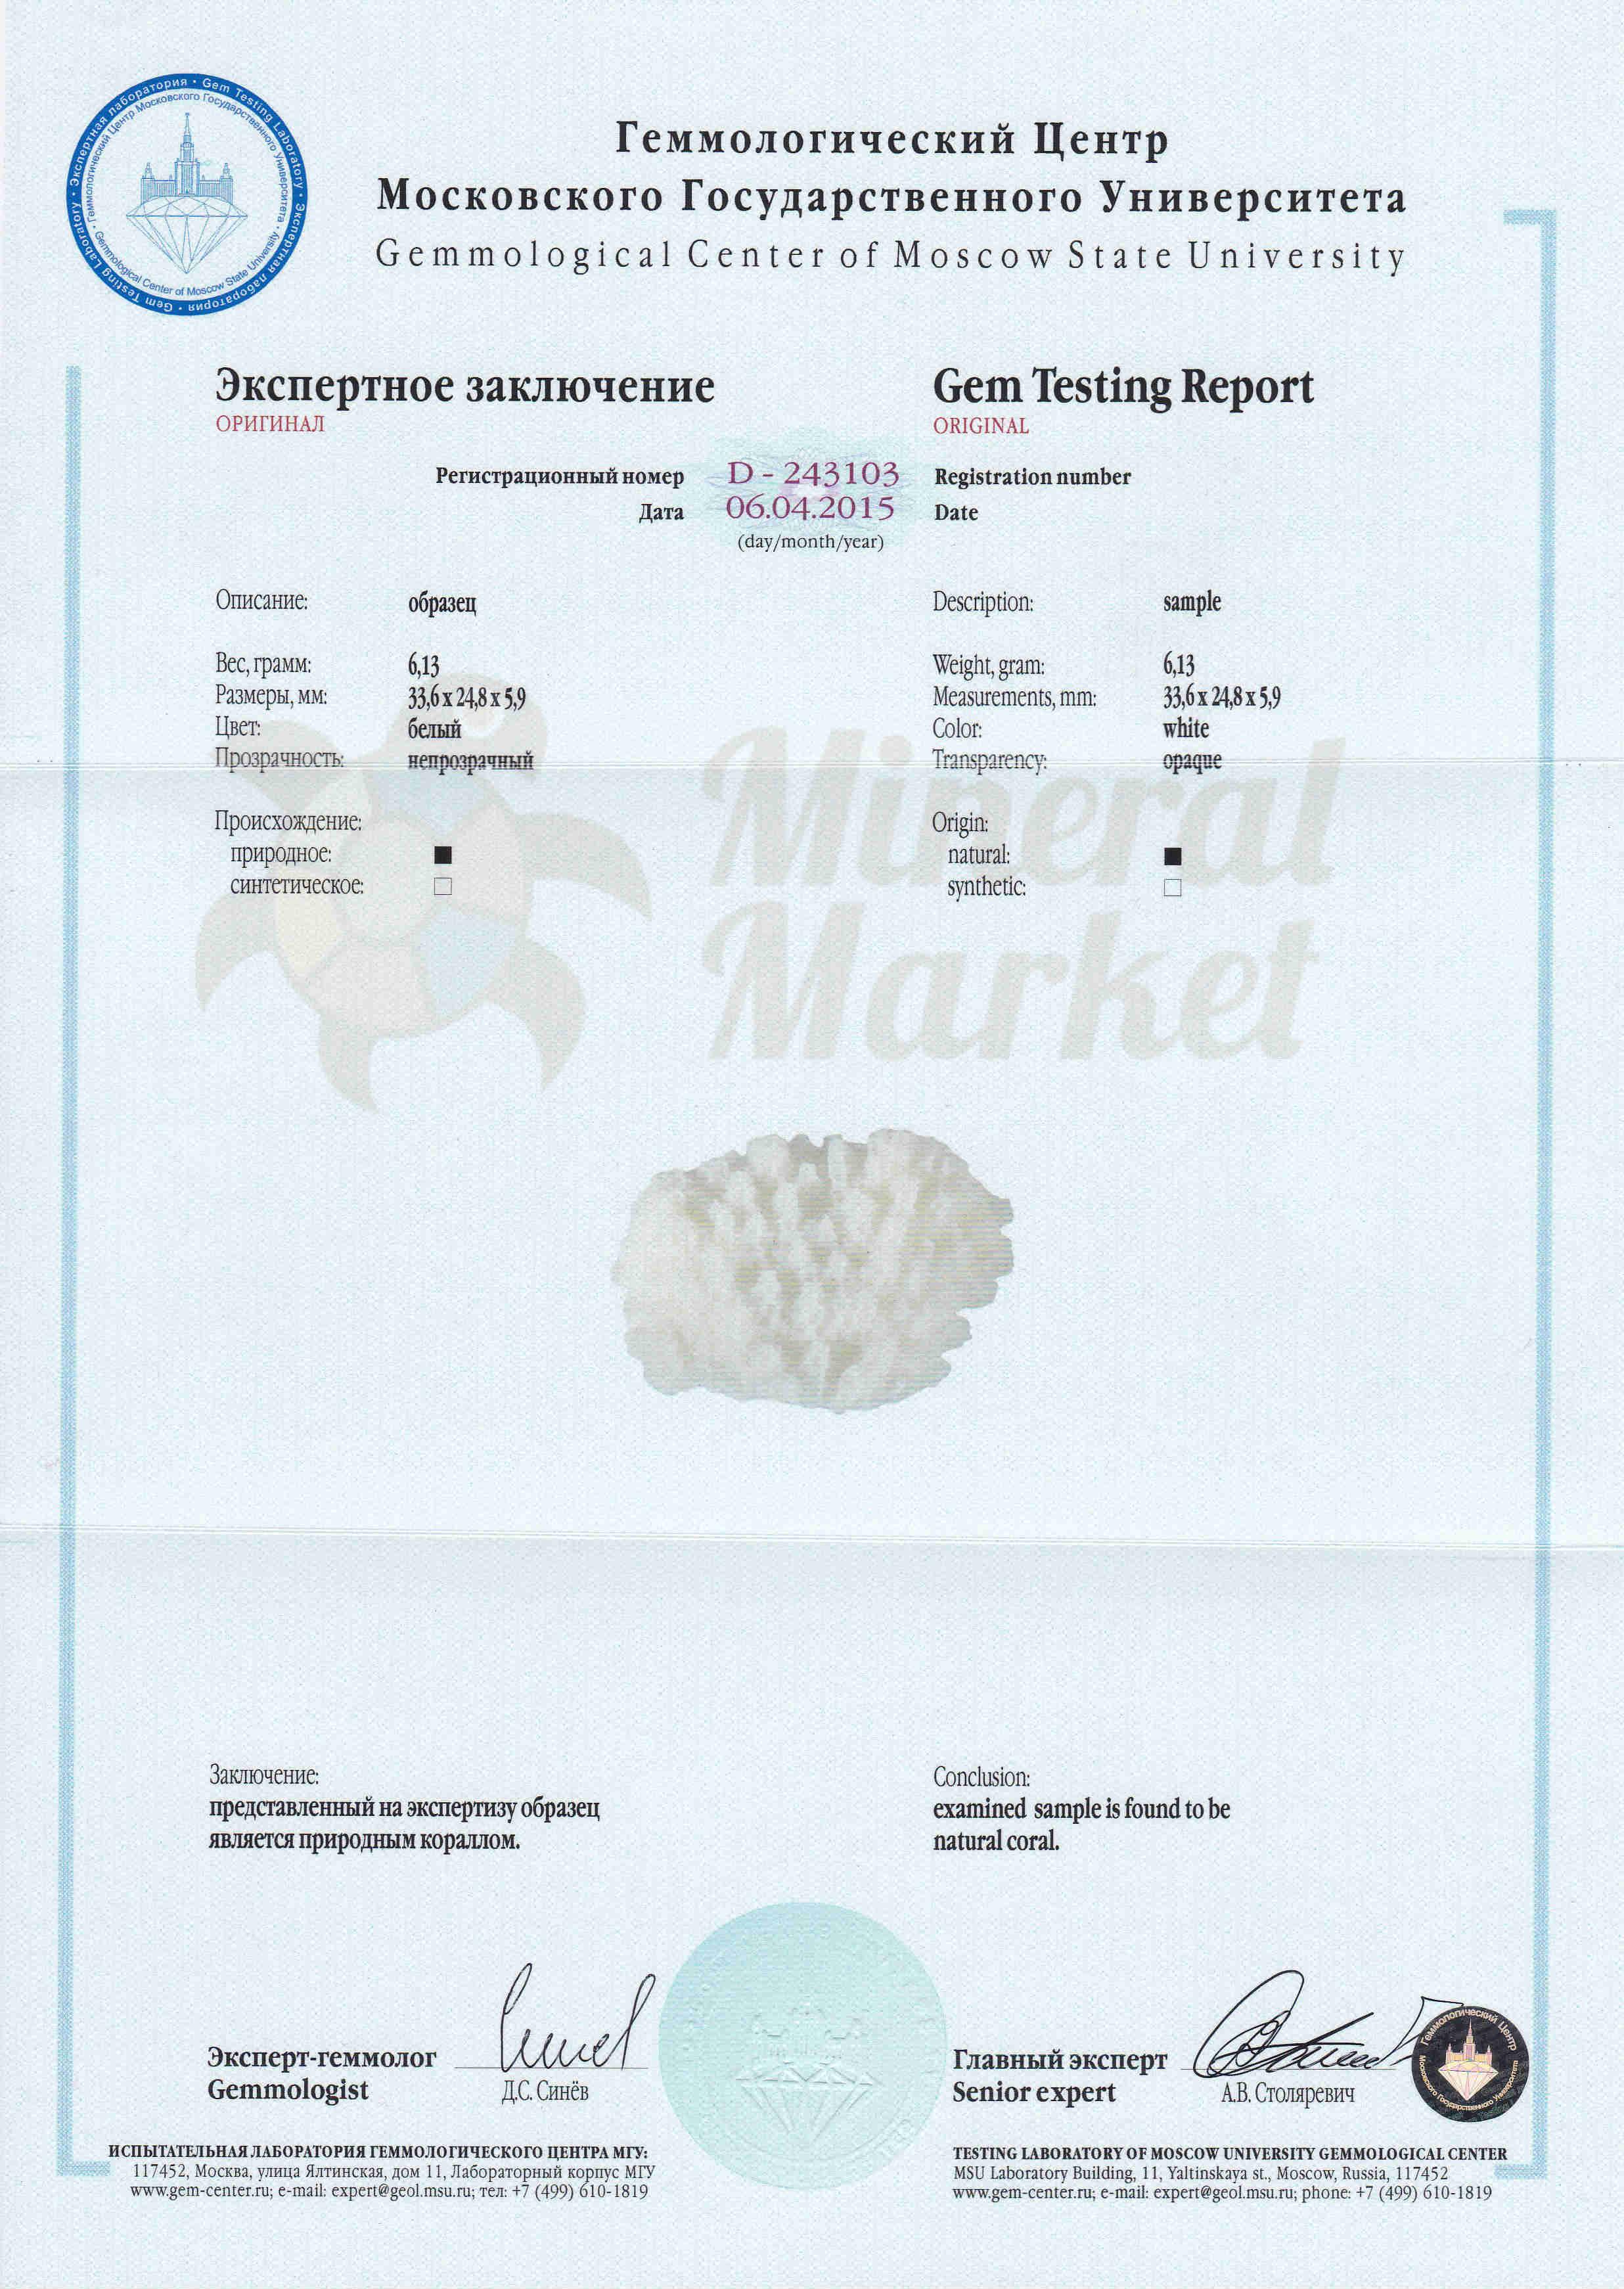 http://mineralmarket.ru/img/certificate/60.jpg